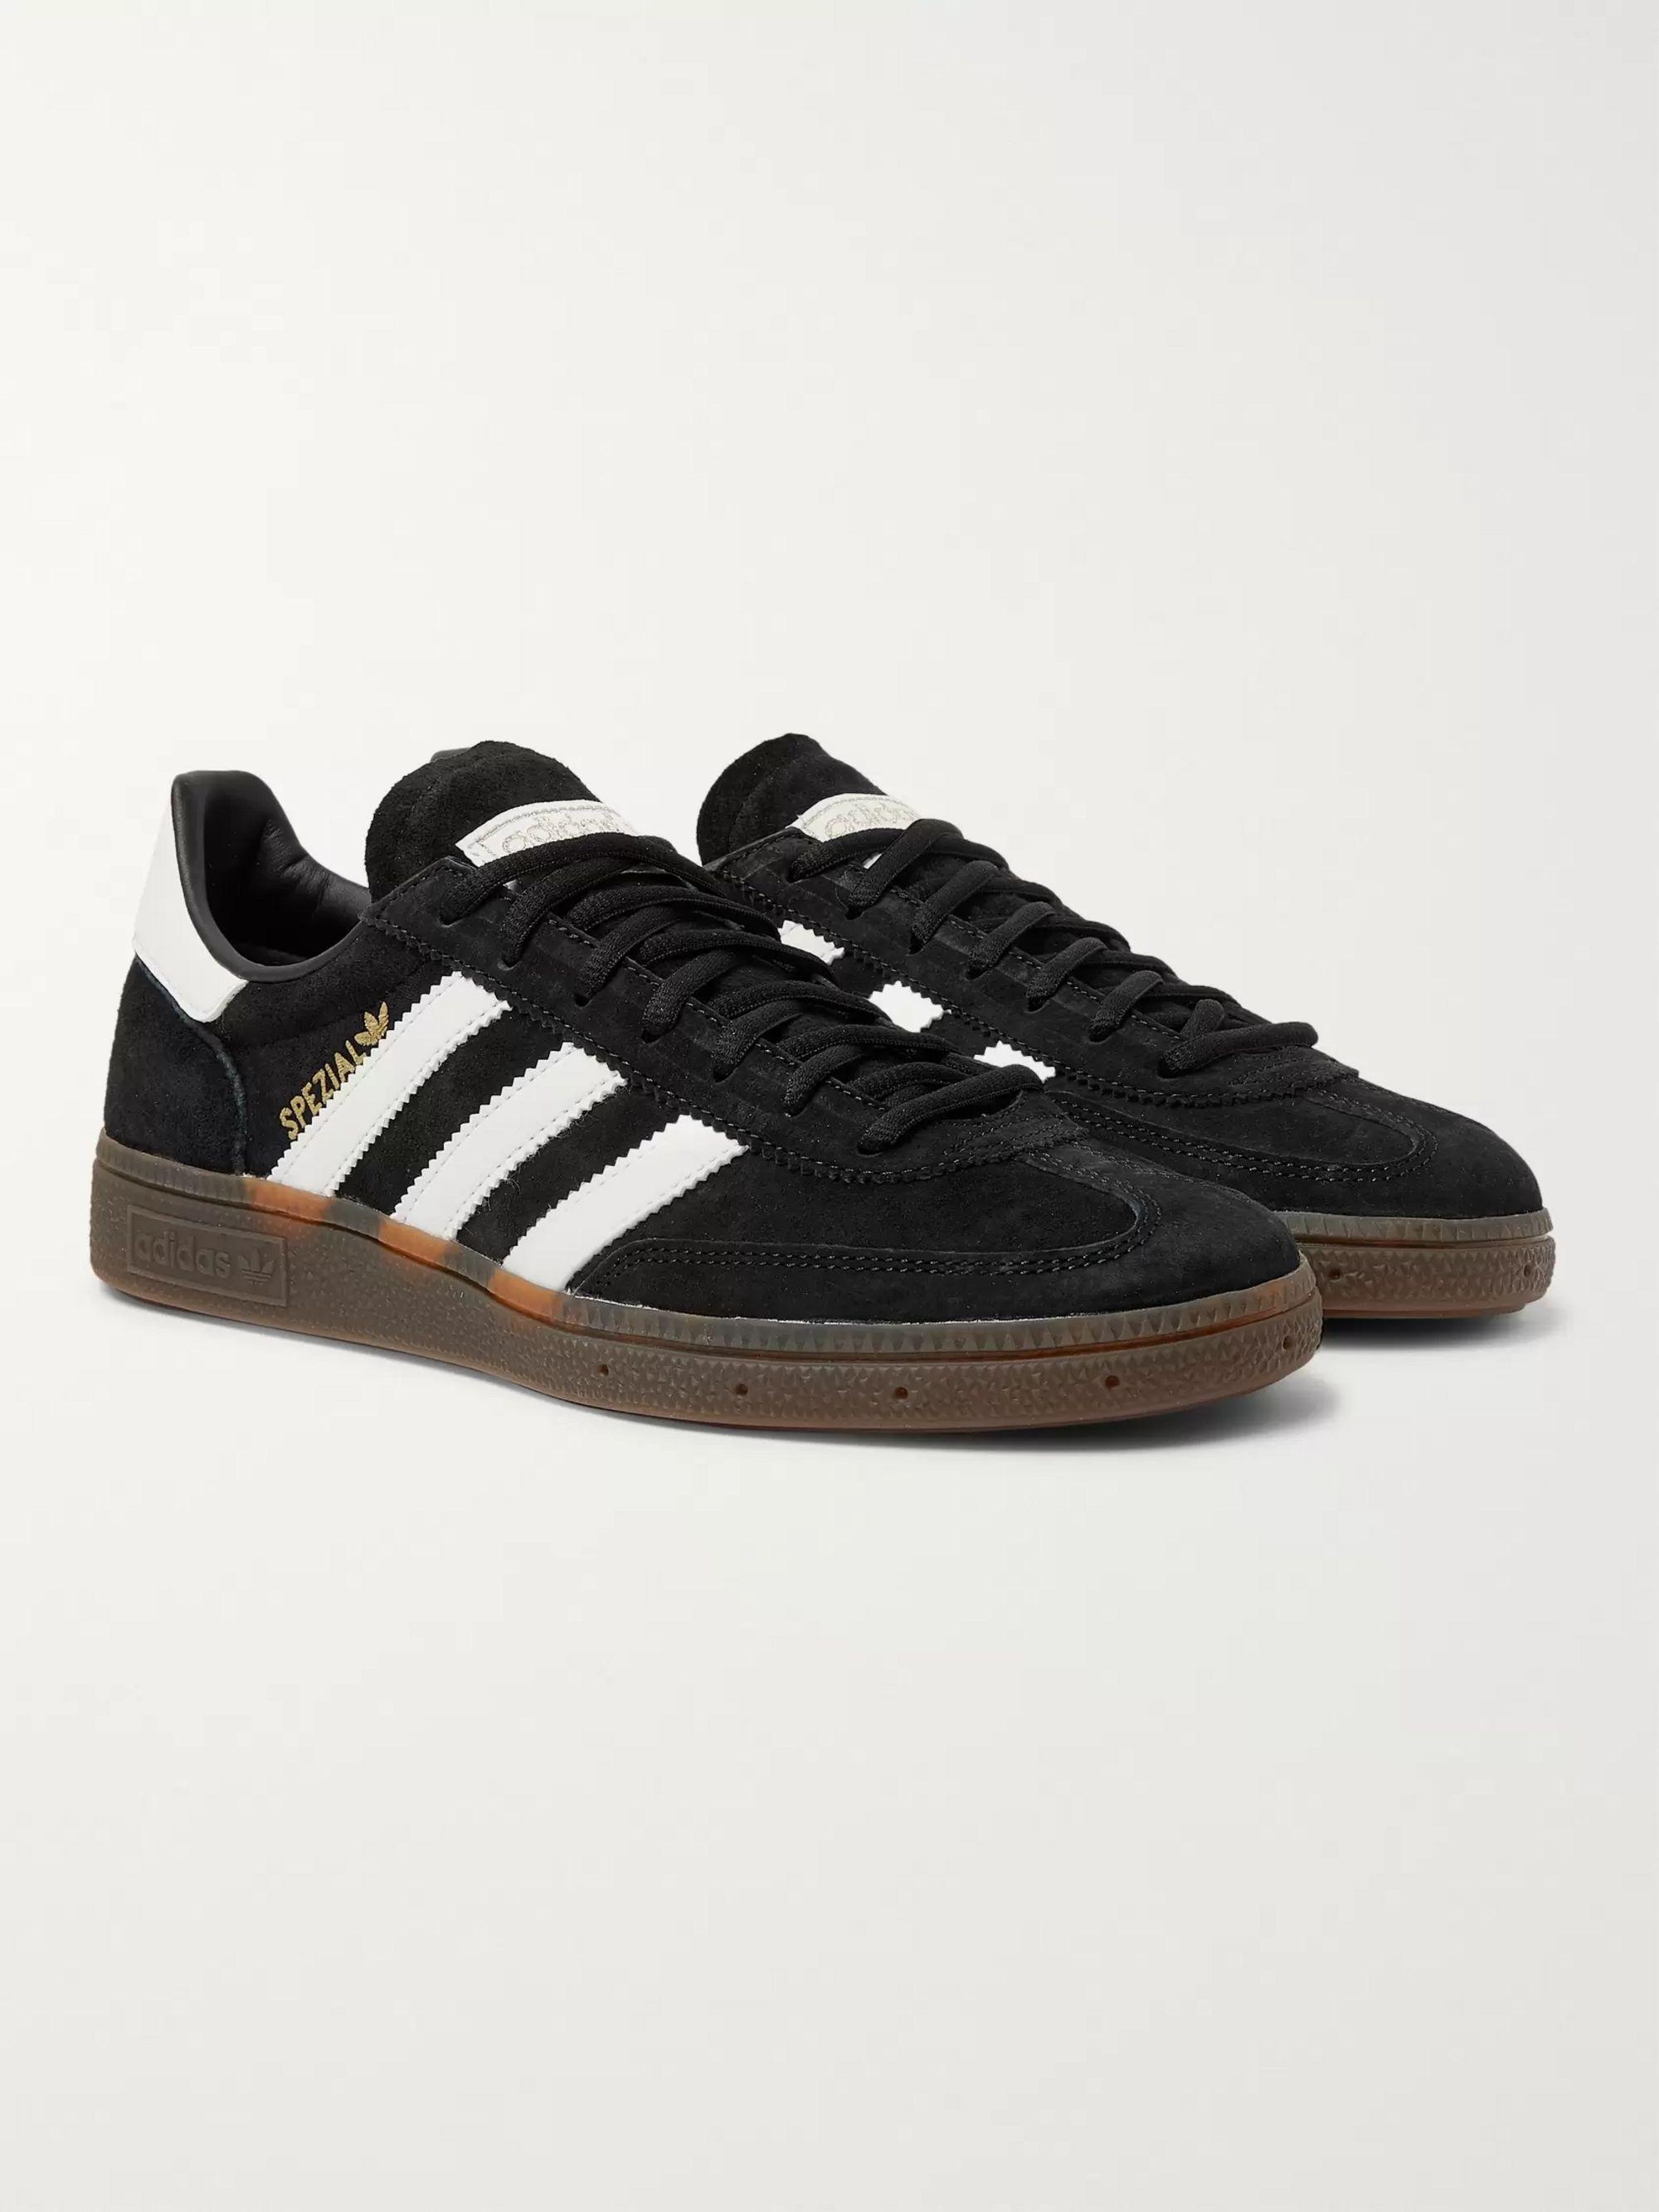 Adidas Spezial Sneakers